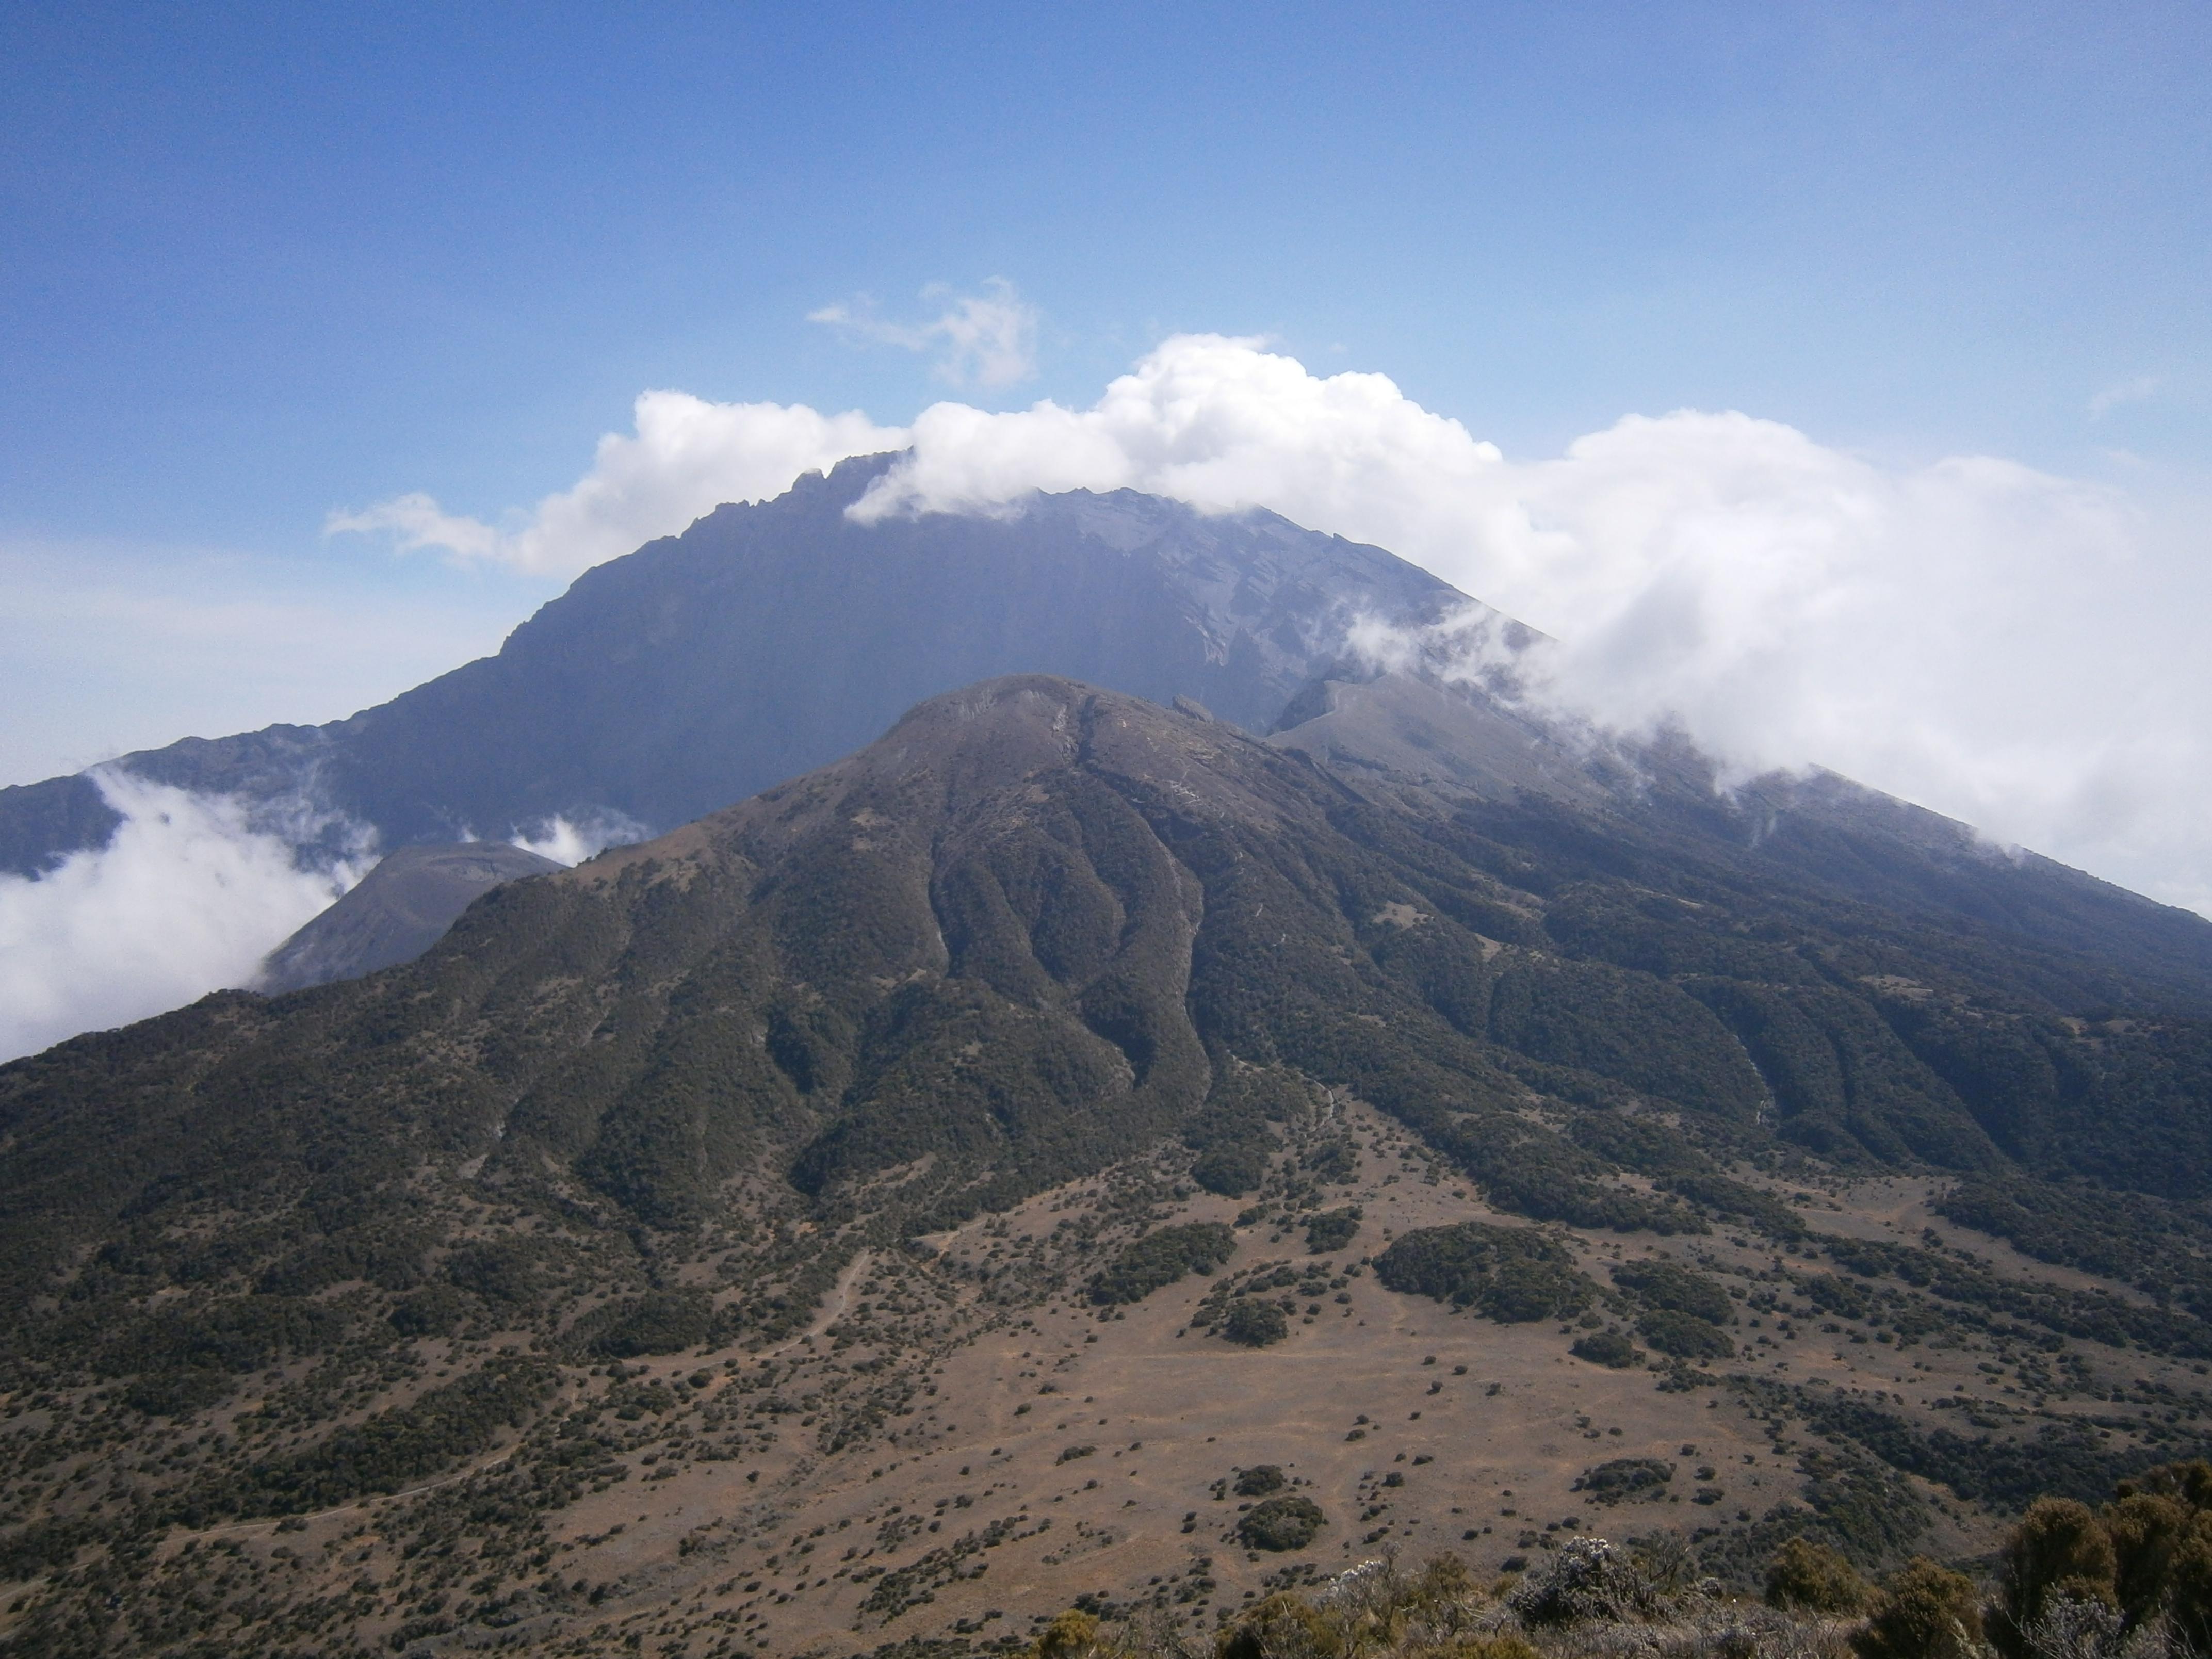 Mount Meru – August 2012